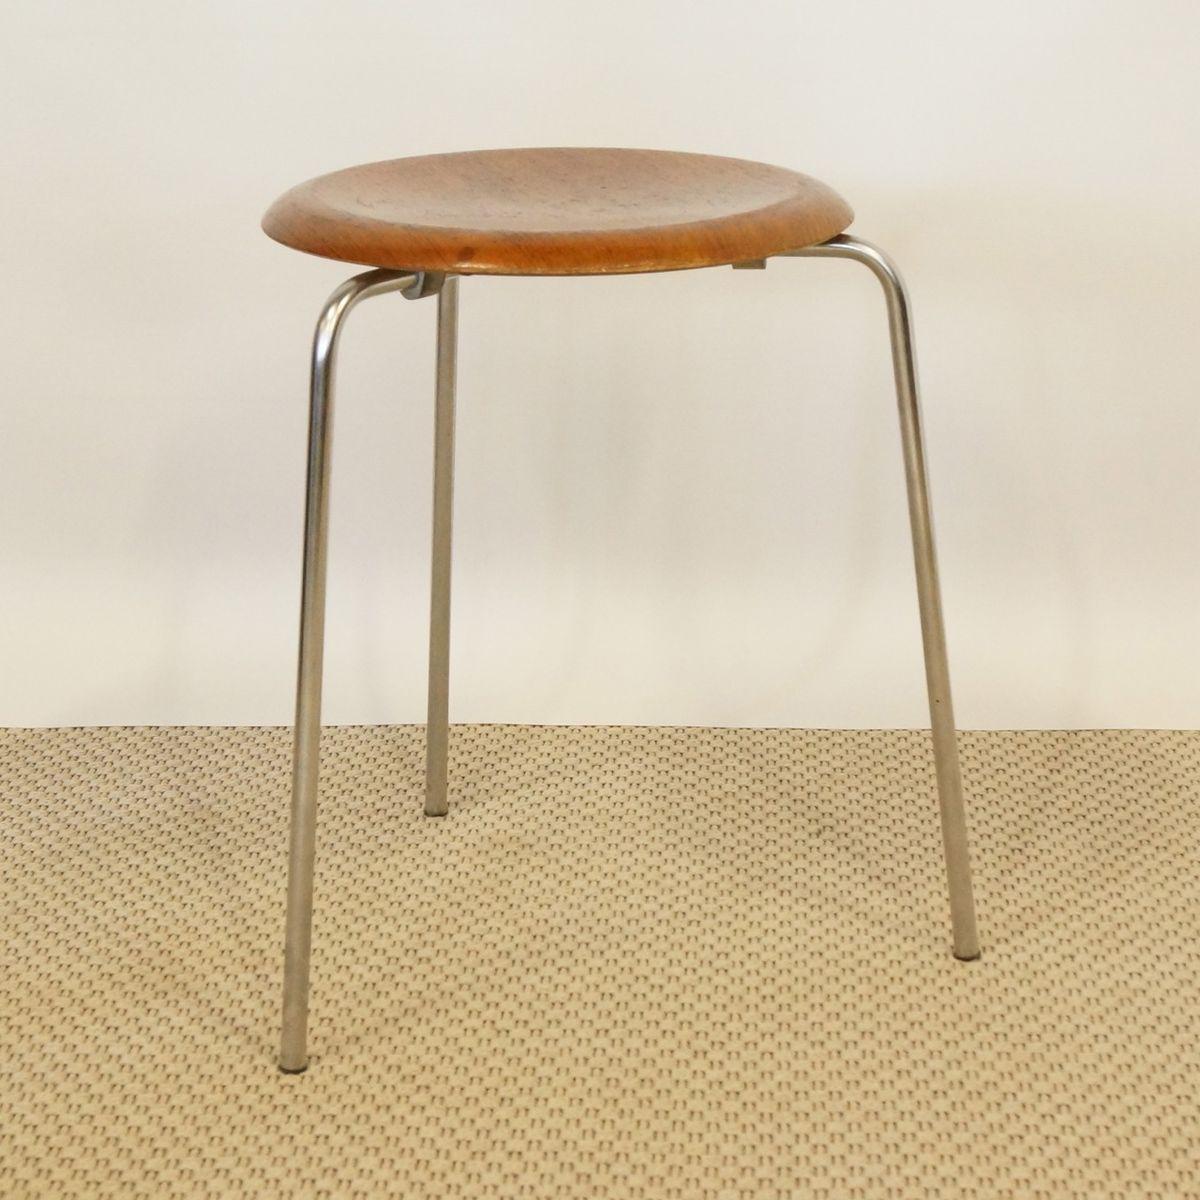 dot stool by arne jacobsen for fritz hansen for sale at pamono. Black Bedroom Furniture Sets. Home Design Ideas